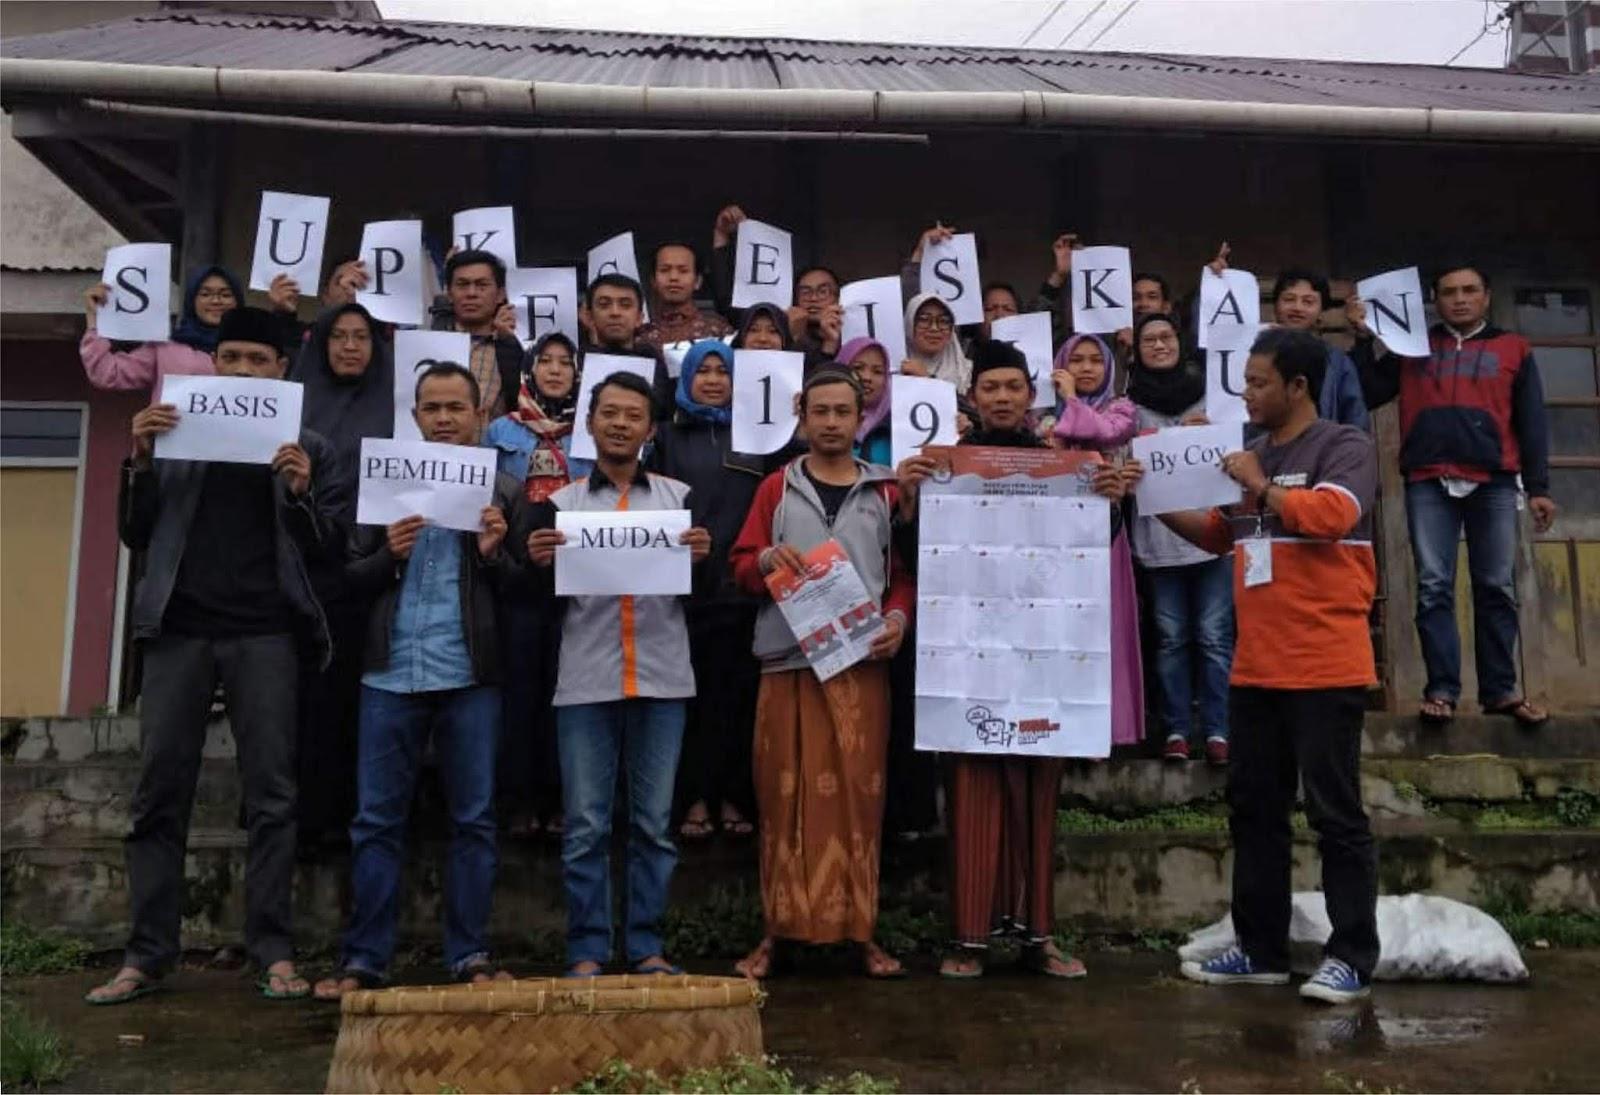 Demi Sosialisasi Relawan Demokrasi Menembus Kabut Tebal